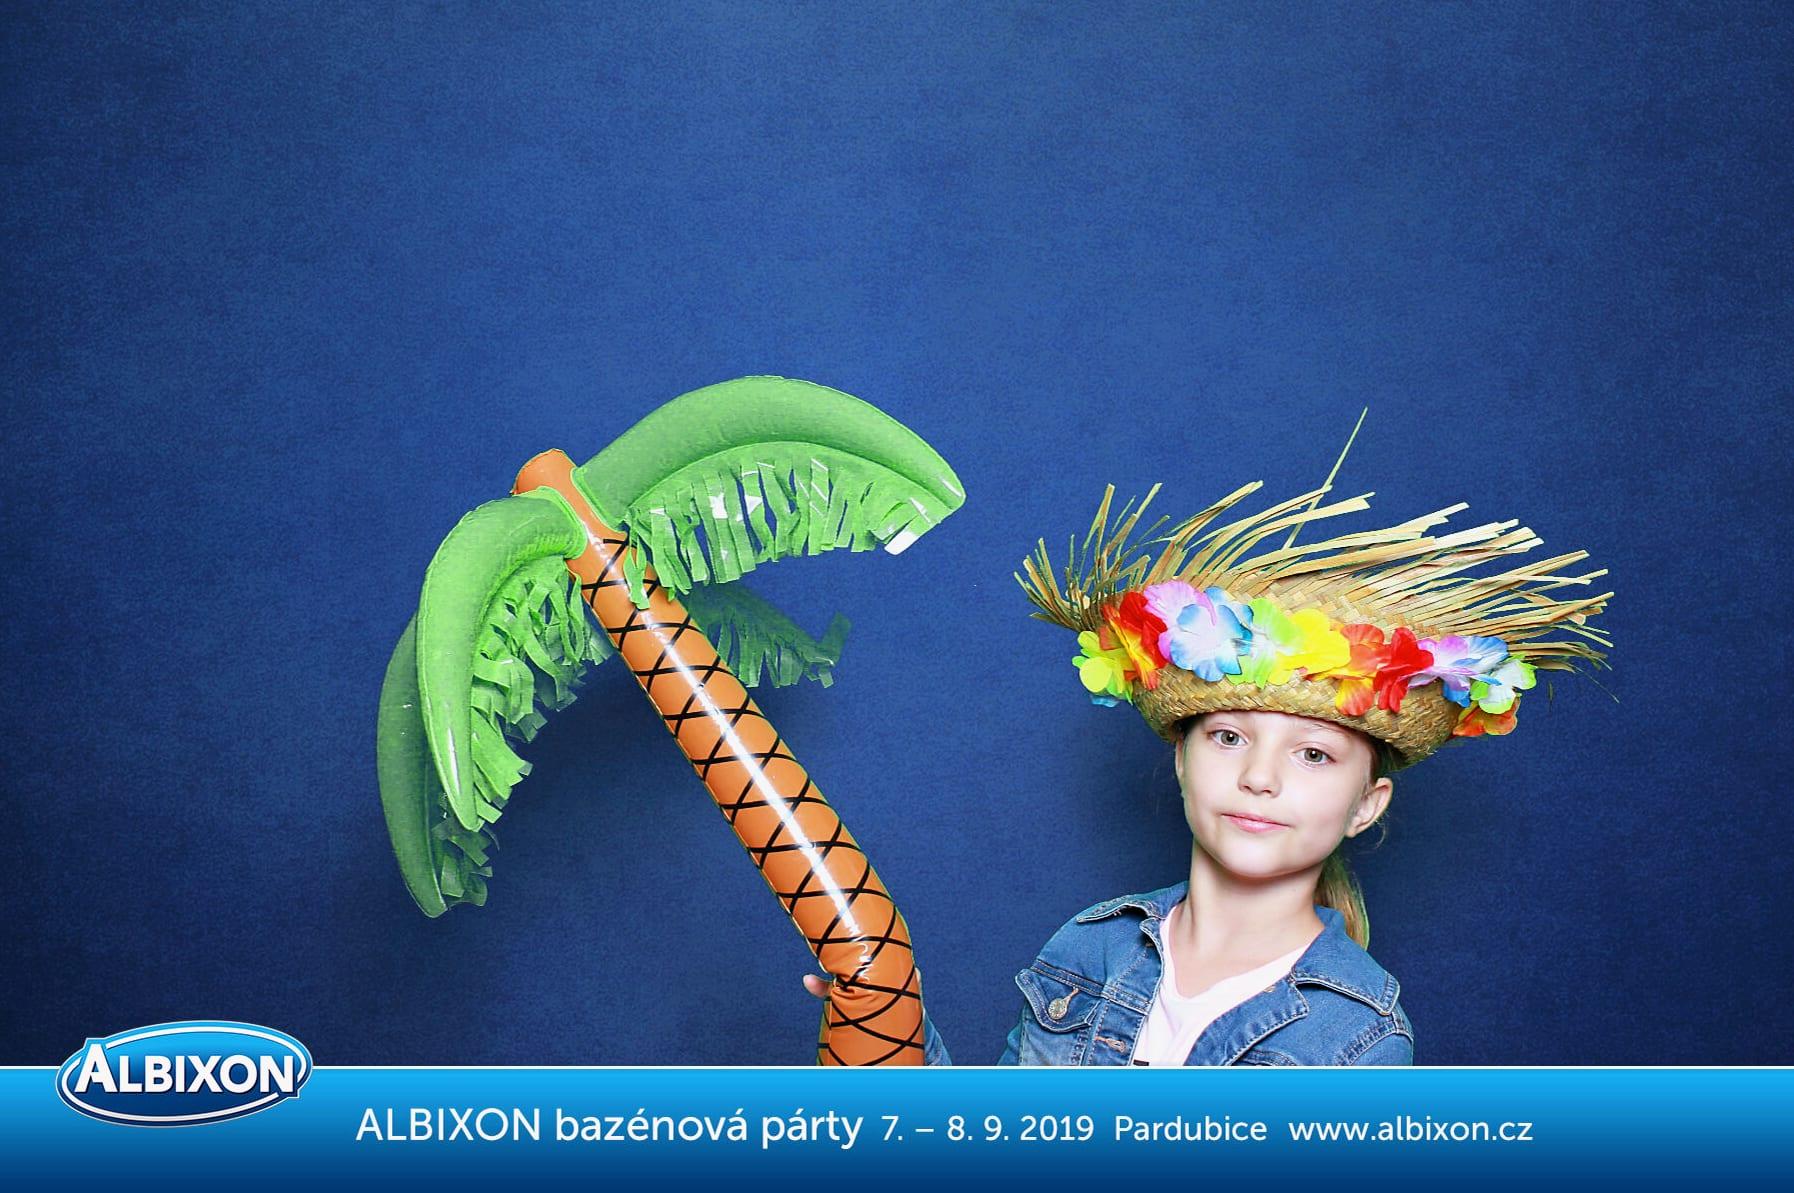 fotokoutek-pardubice-promo-akce-albixon-pardubice-7-9-2019-649451